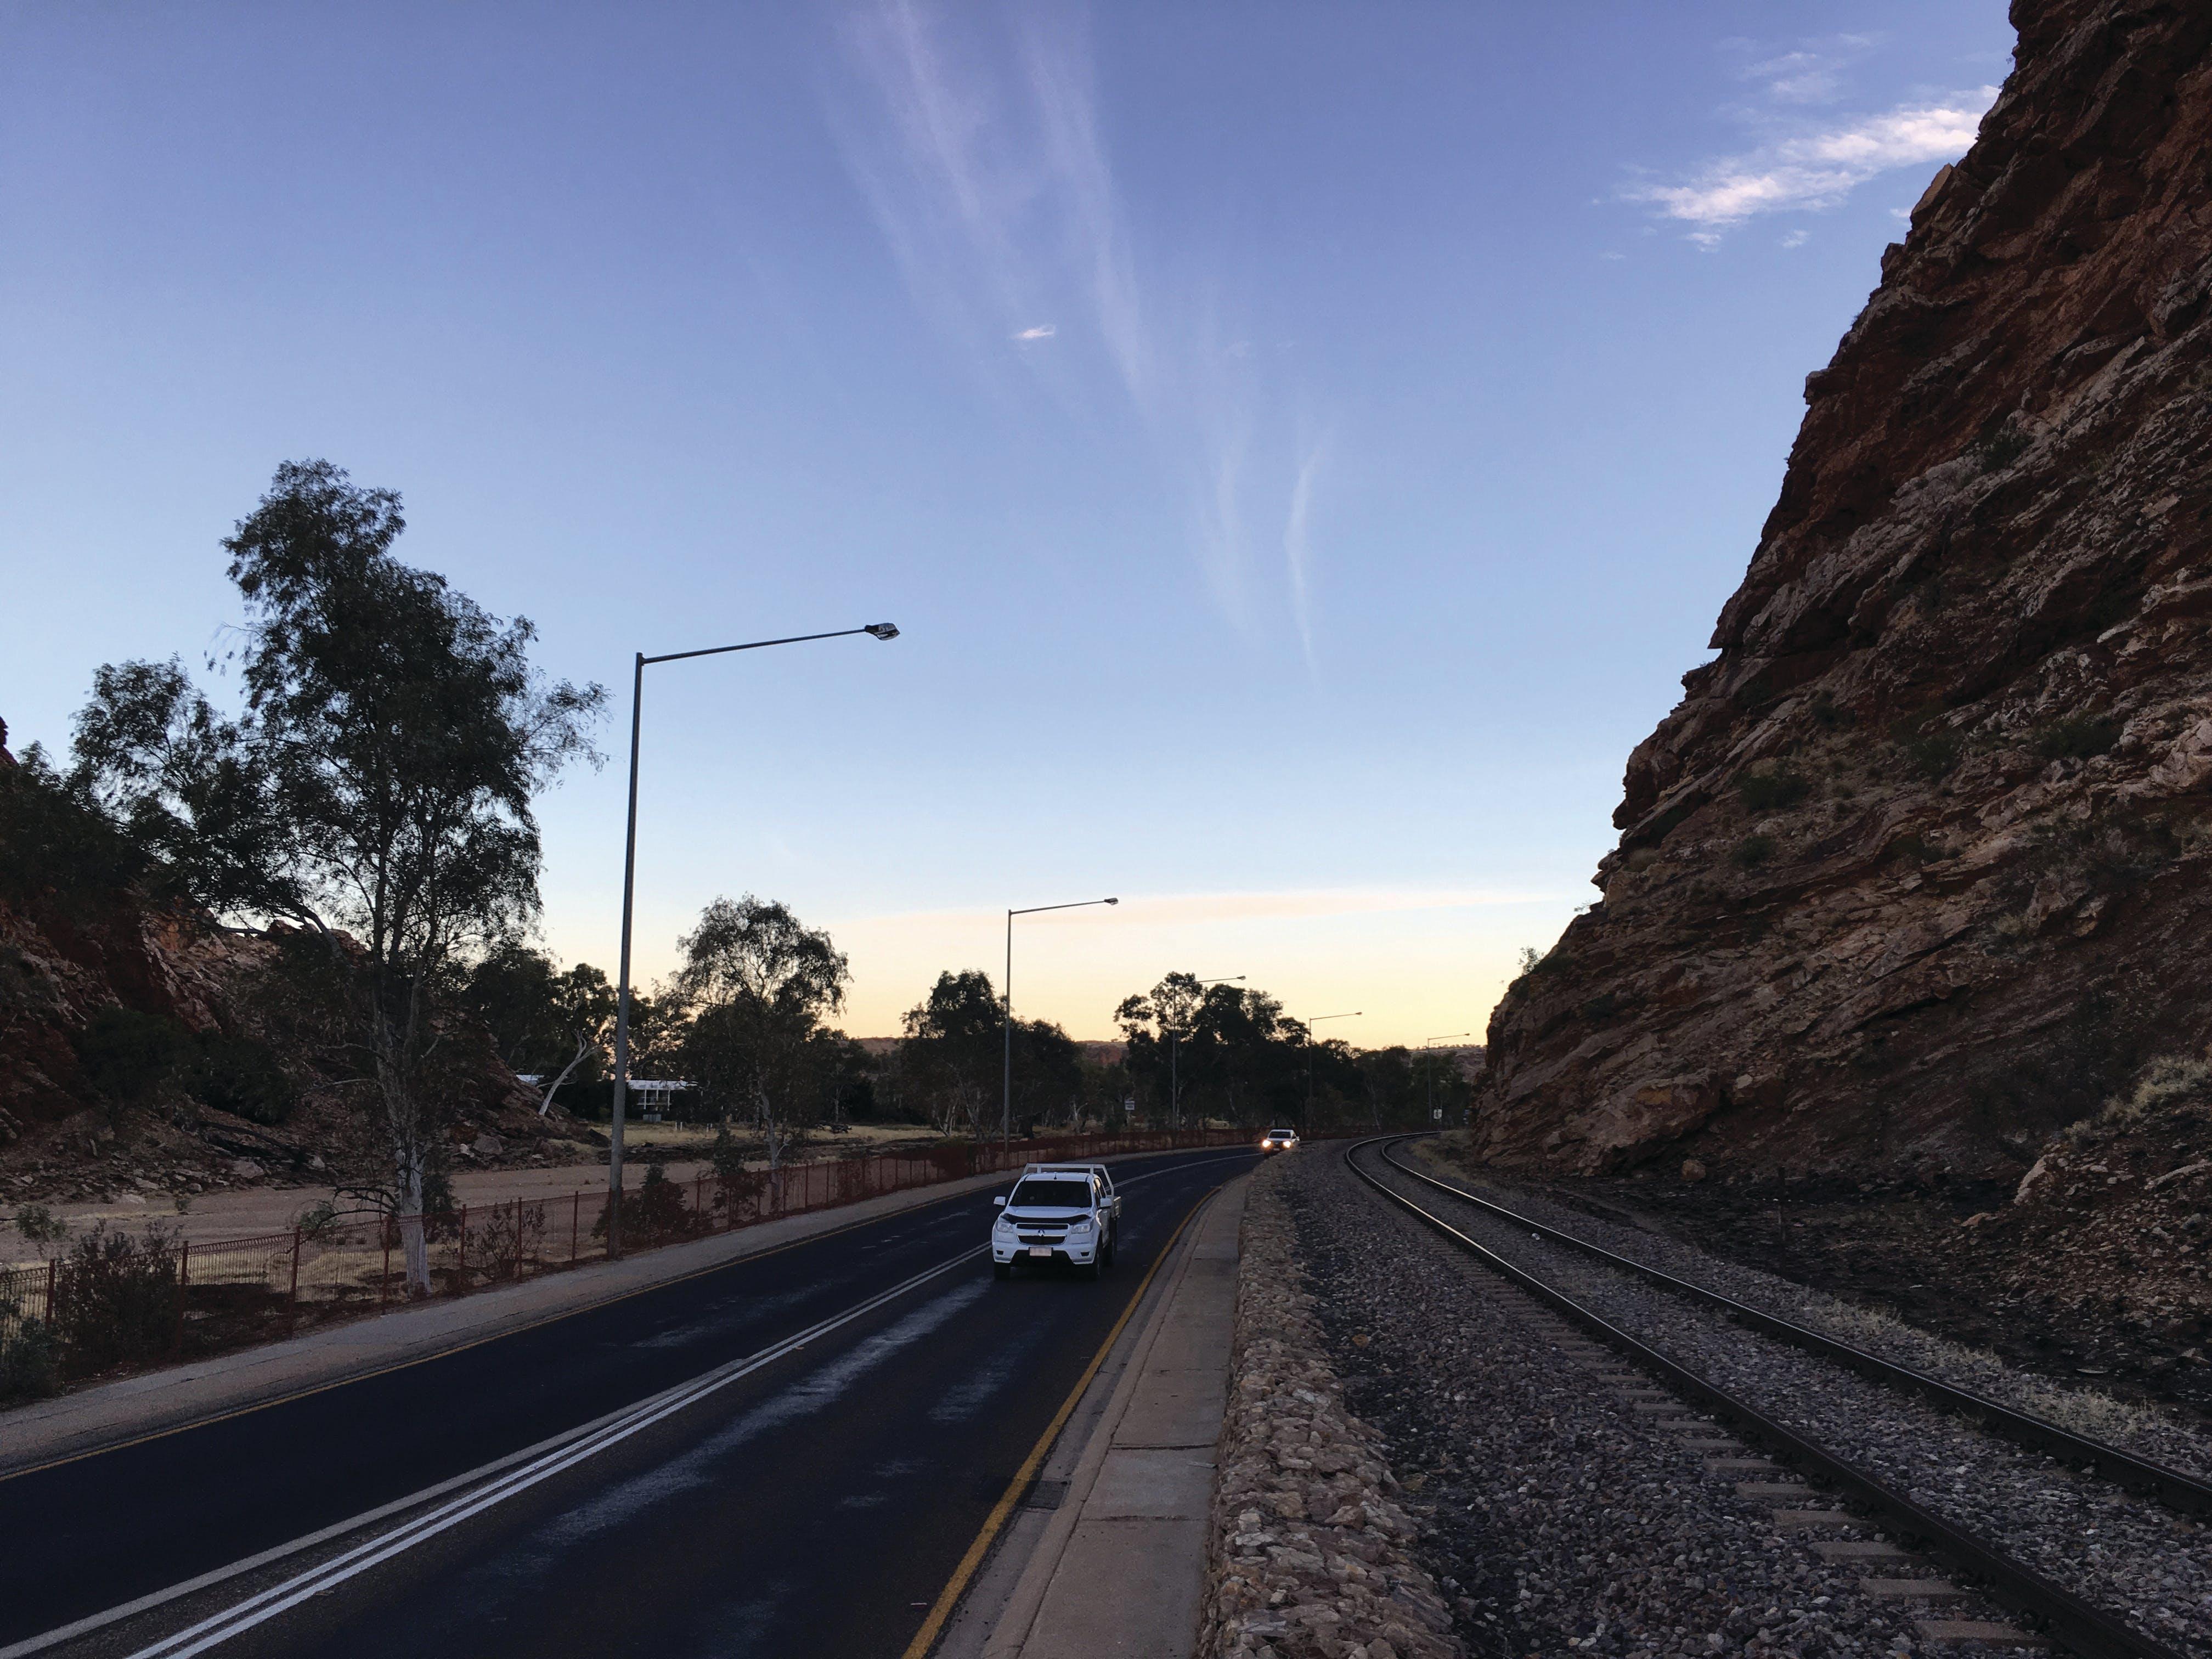 Twilight traffic at The Gap (Ntaripe)